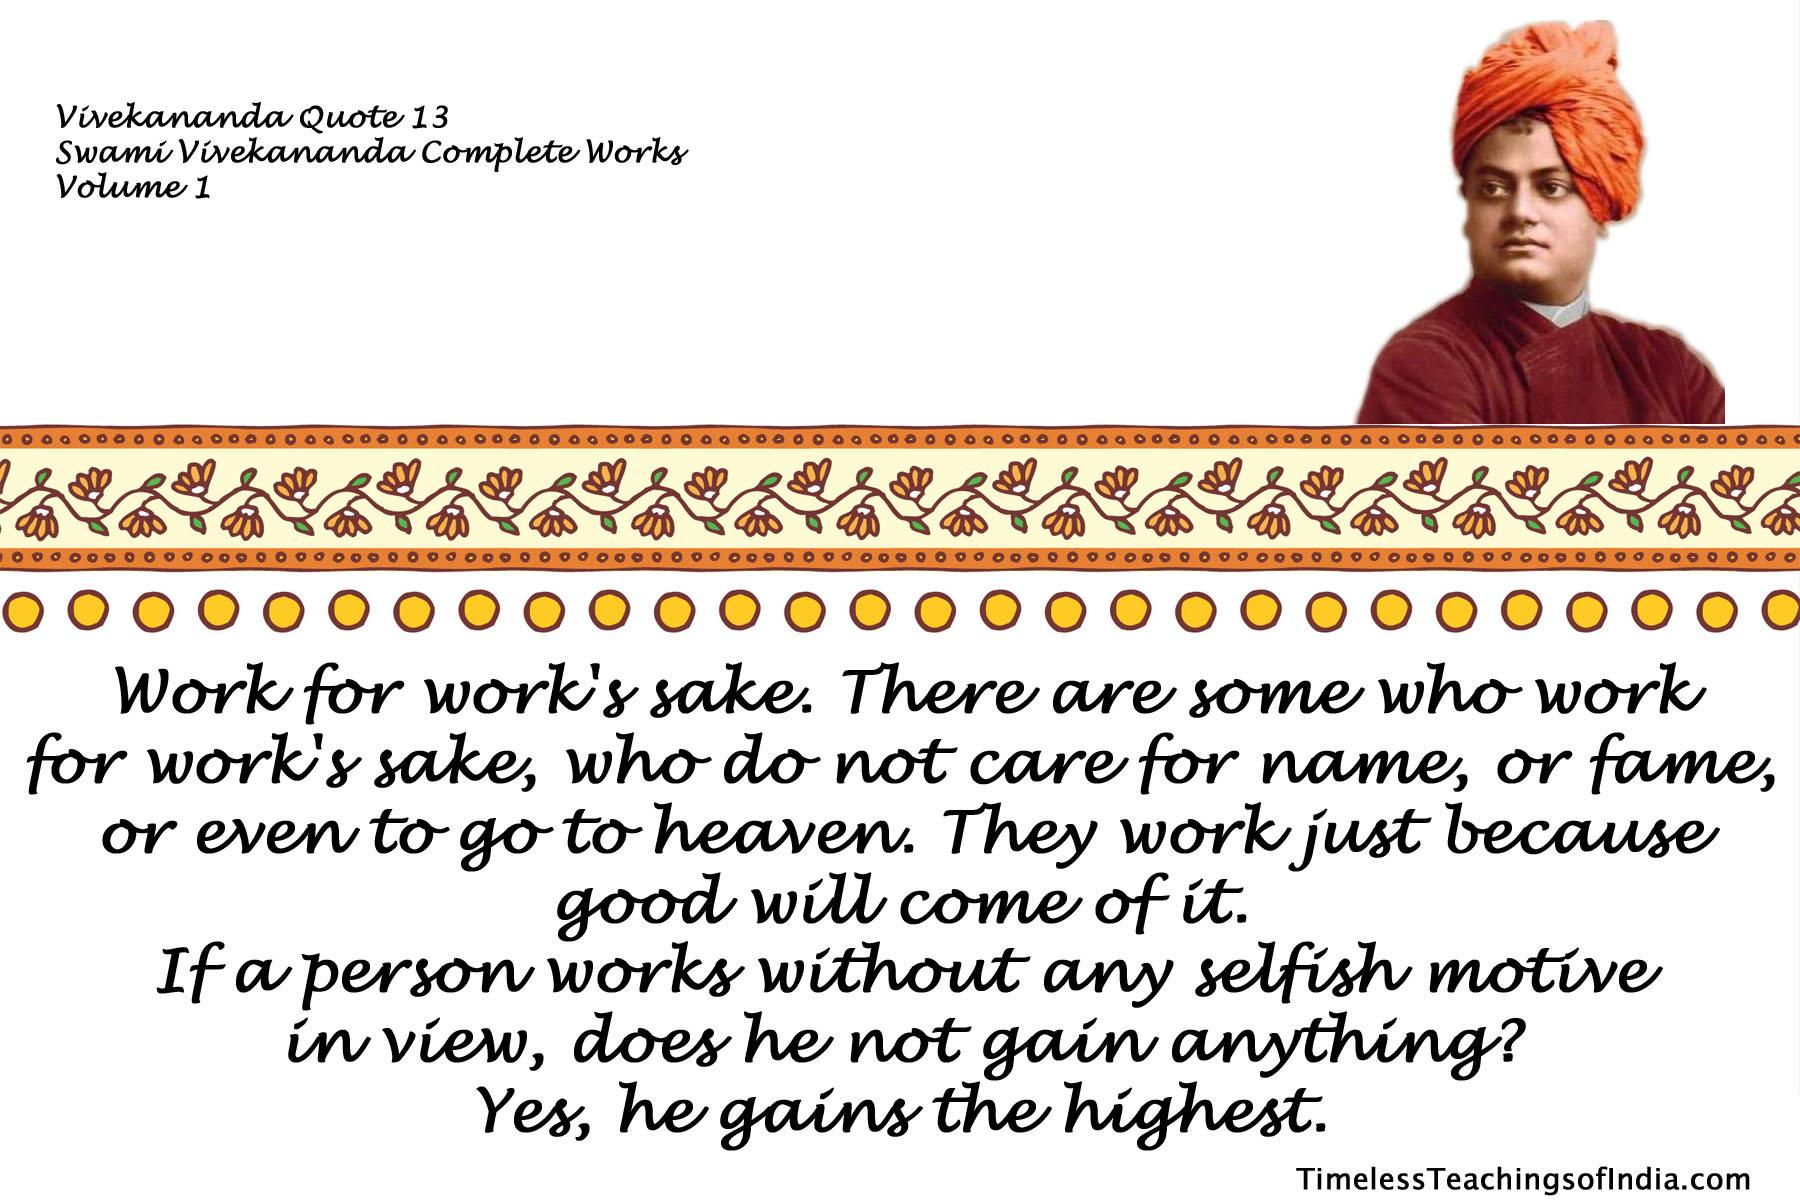 Vivekananda Quote 13